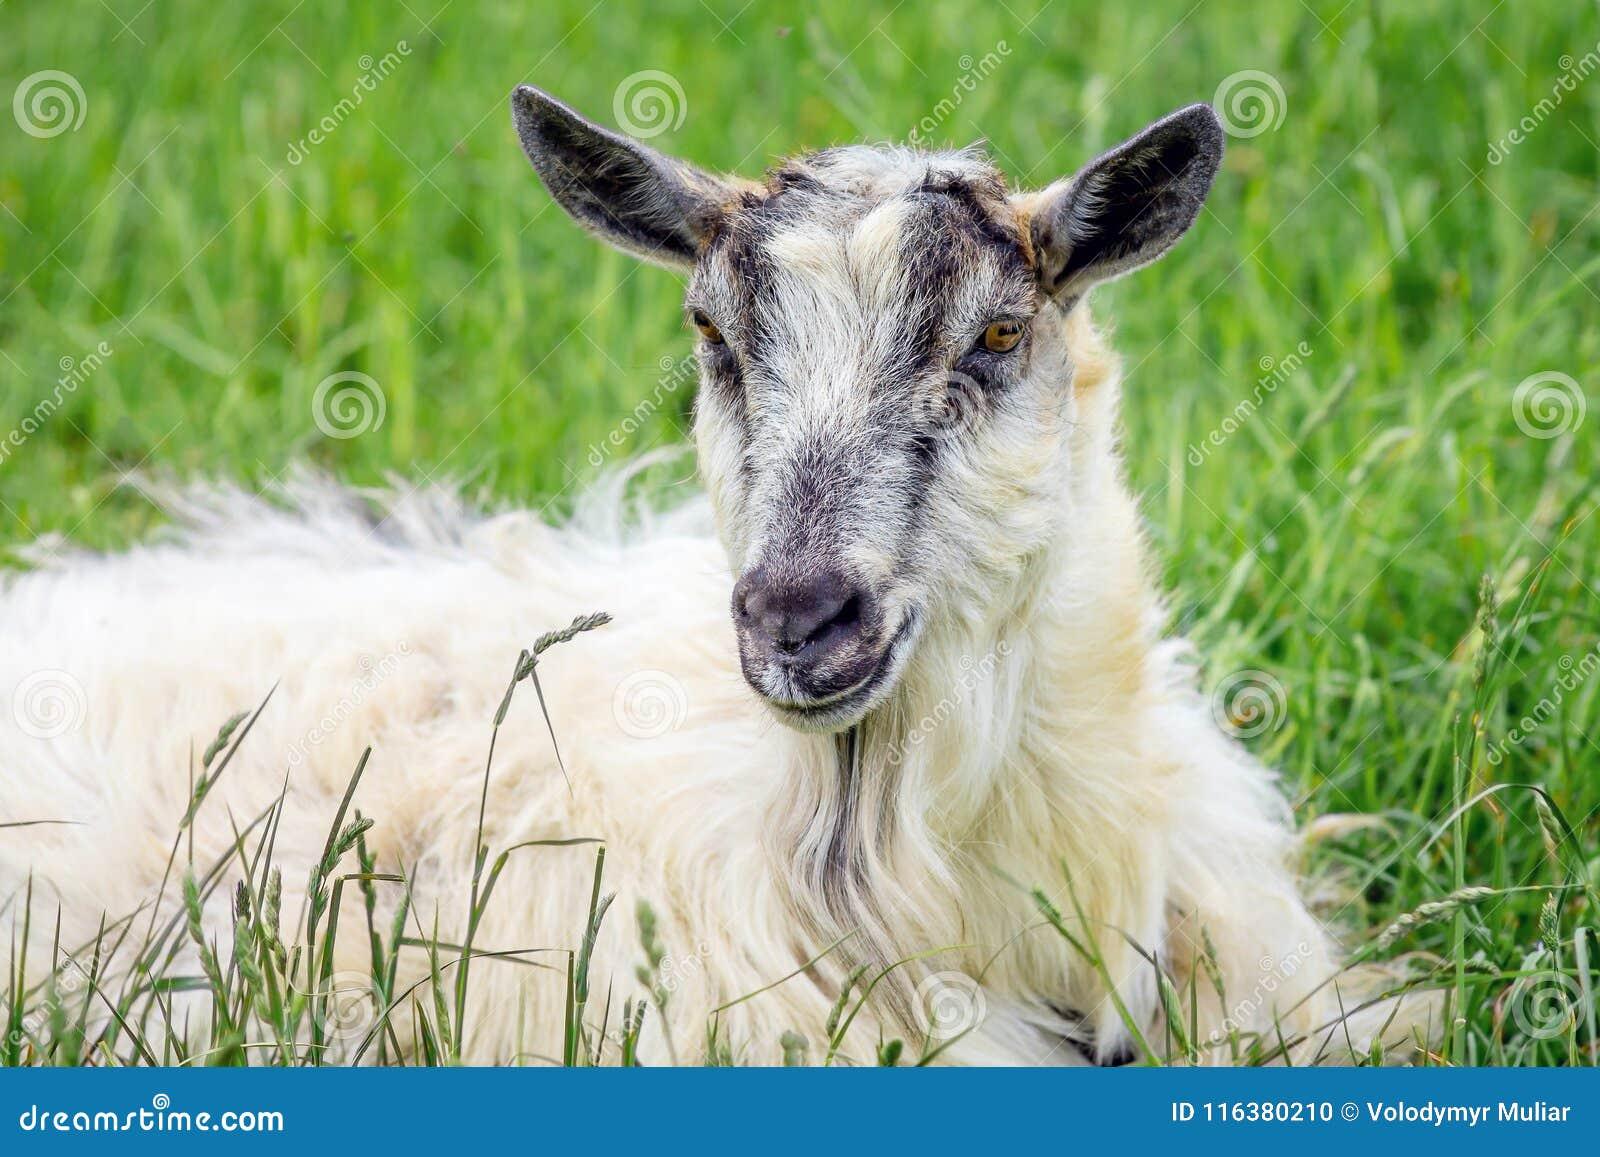 Portret van witte geit tegen groene grasachtergrond binnenlands